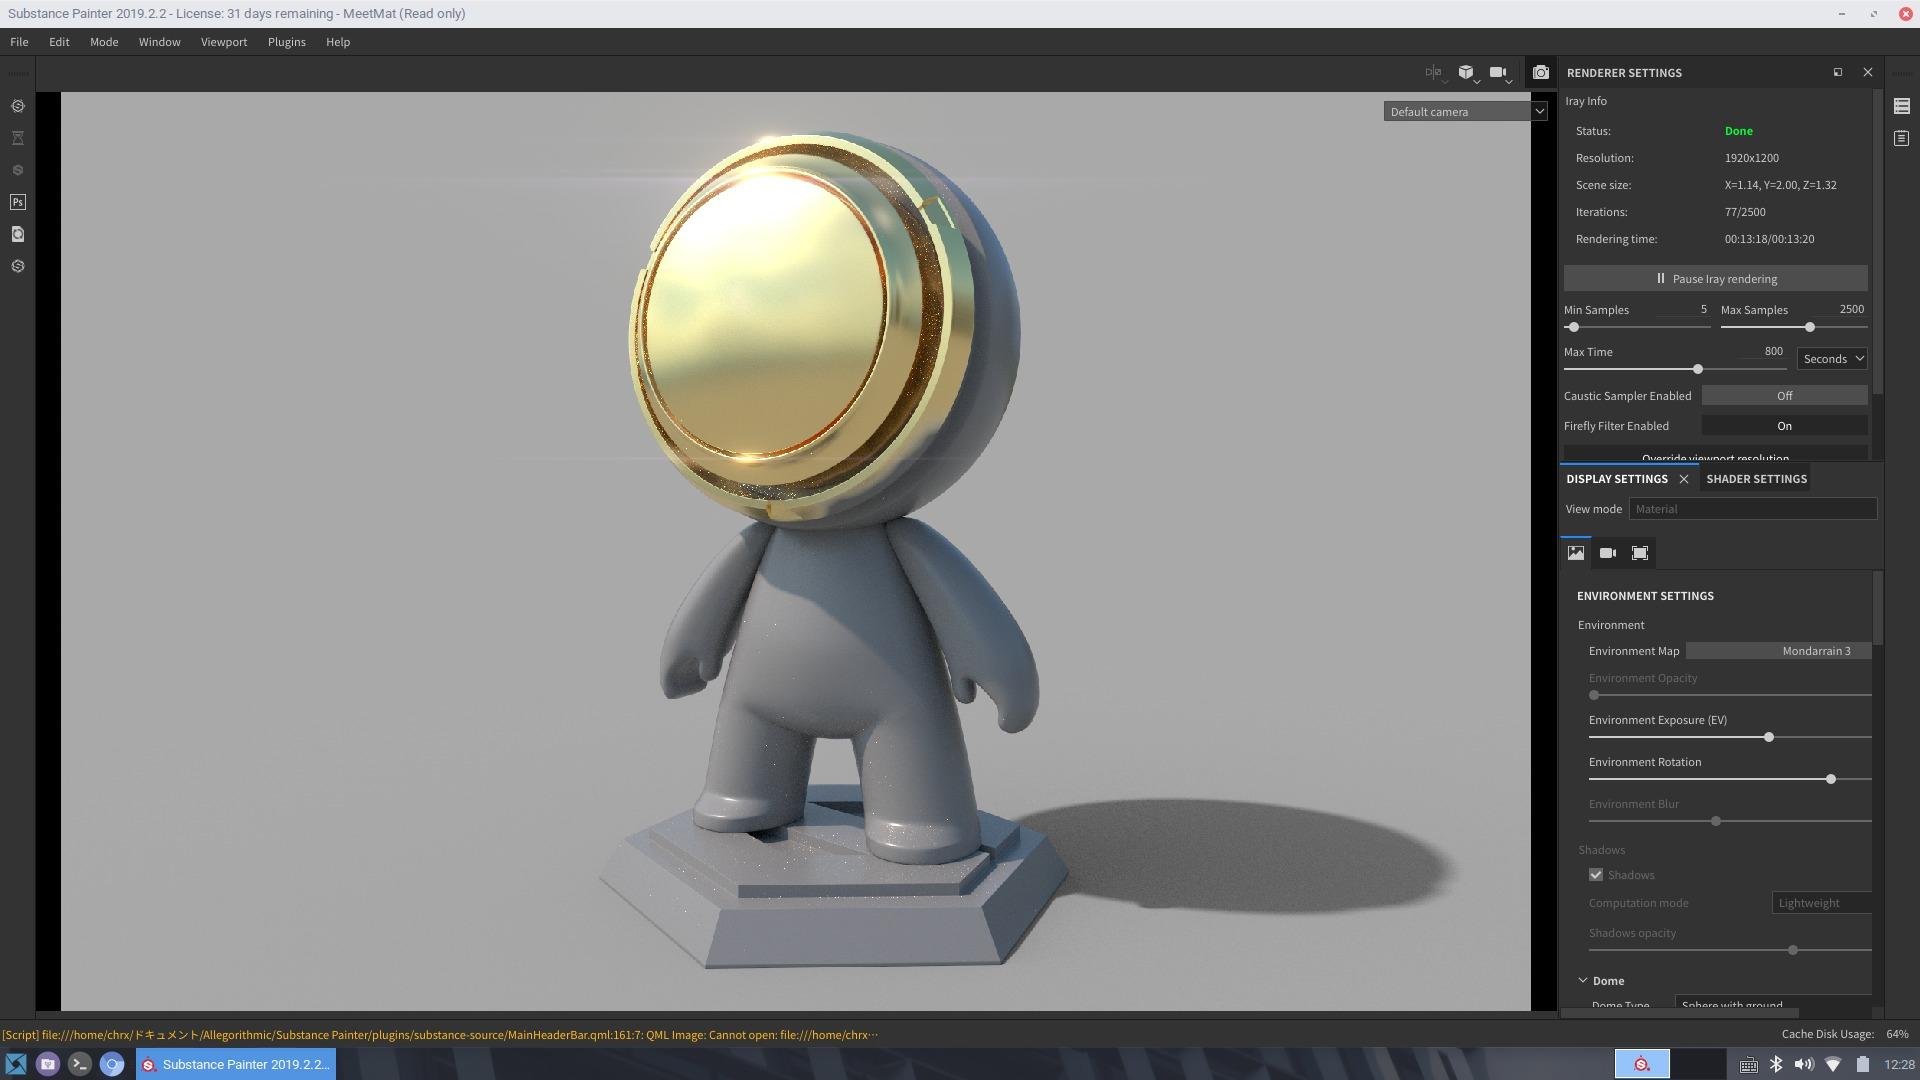 GalliumOS Linux Chromebook Adobe Substance Painter Iray物理レンダリング